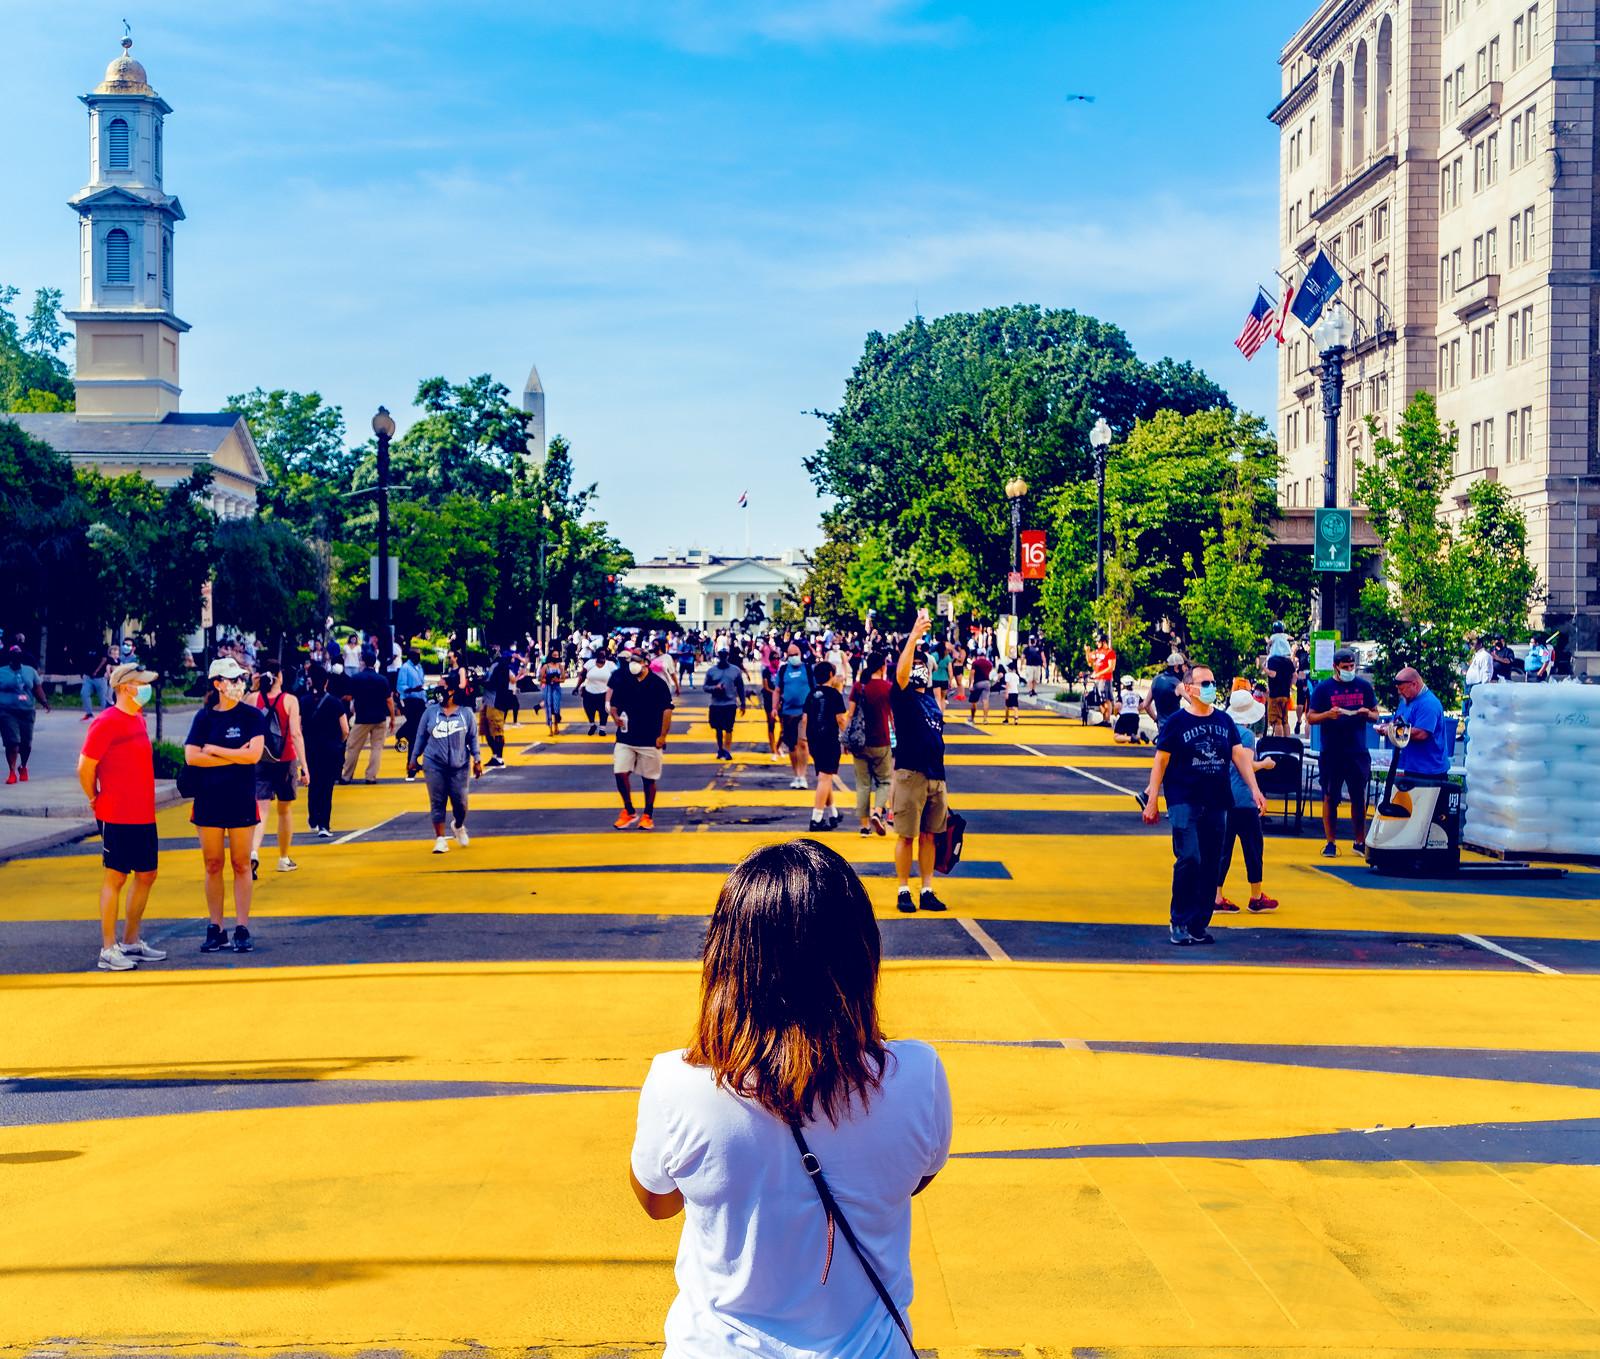 Photos: Black Lives Matter Plaza, Washington, DC USA